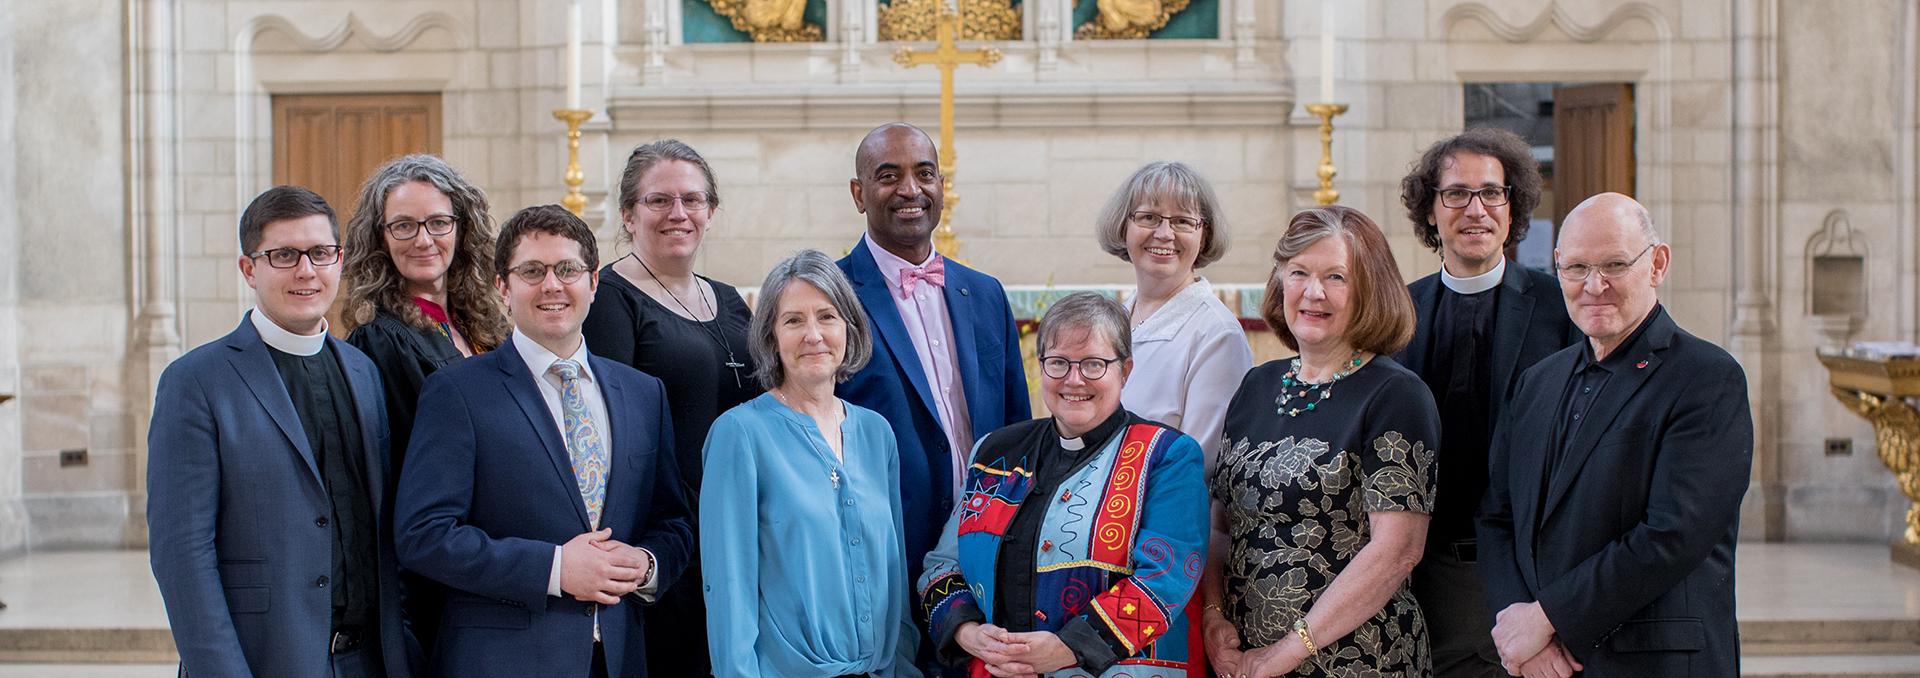 Divinity graduands 2019 in the Chapel